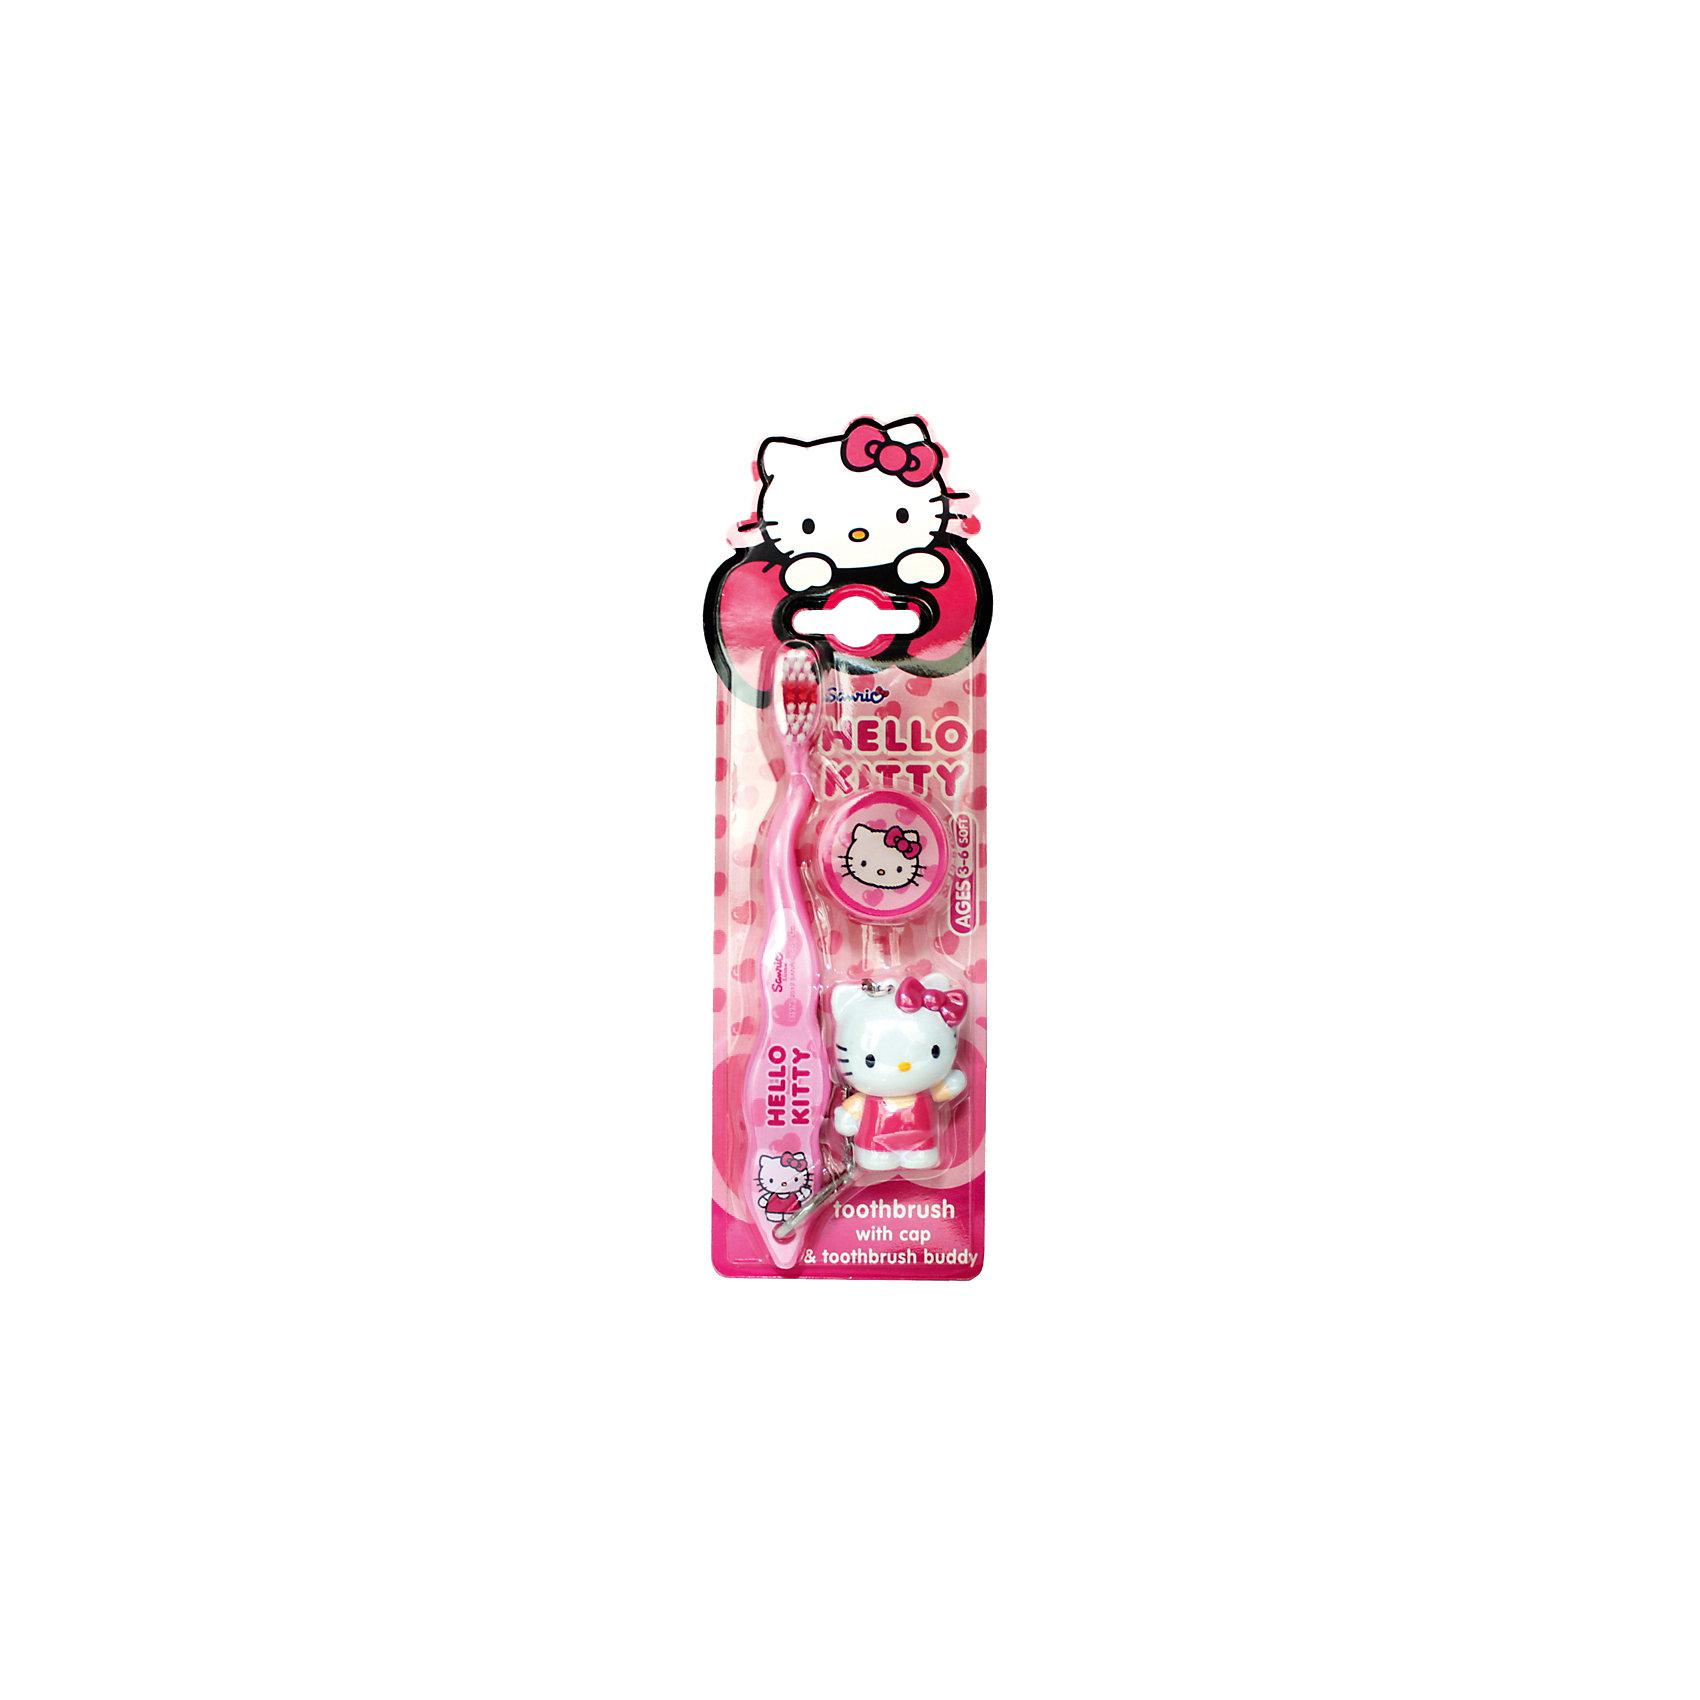 ������ ����� Hello Kitty 3D, �������� � ��������, Firefly